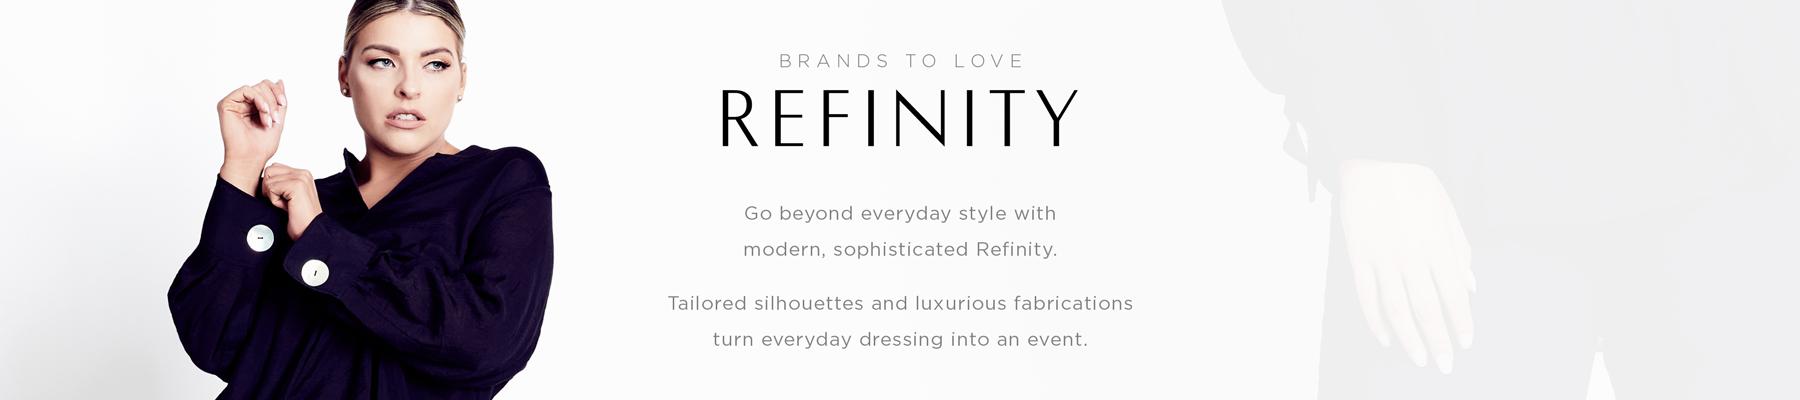 Refinity - Brands to Love